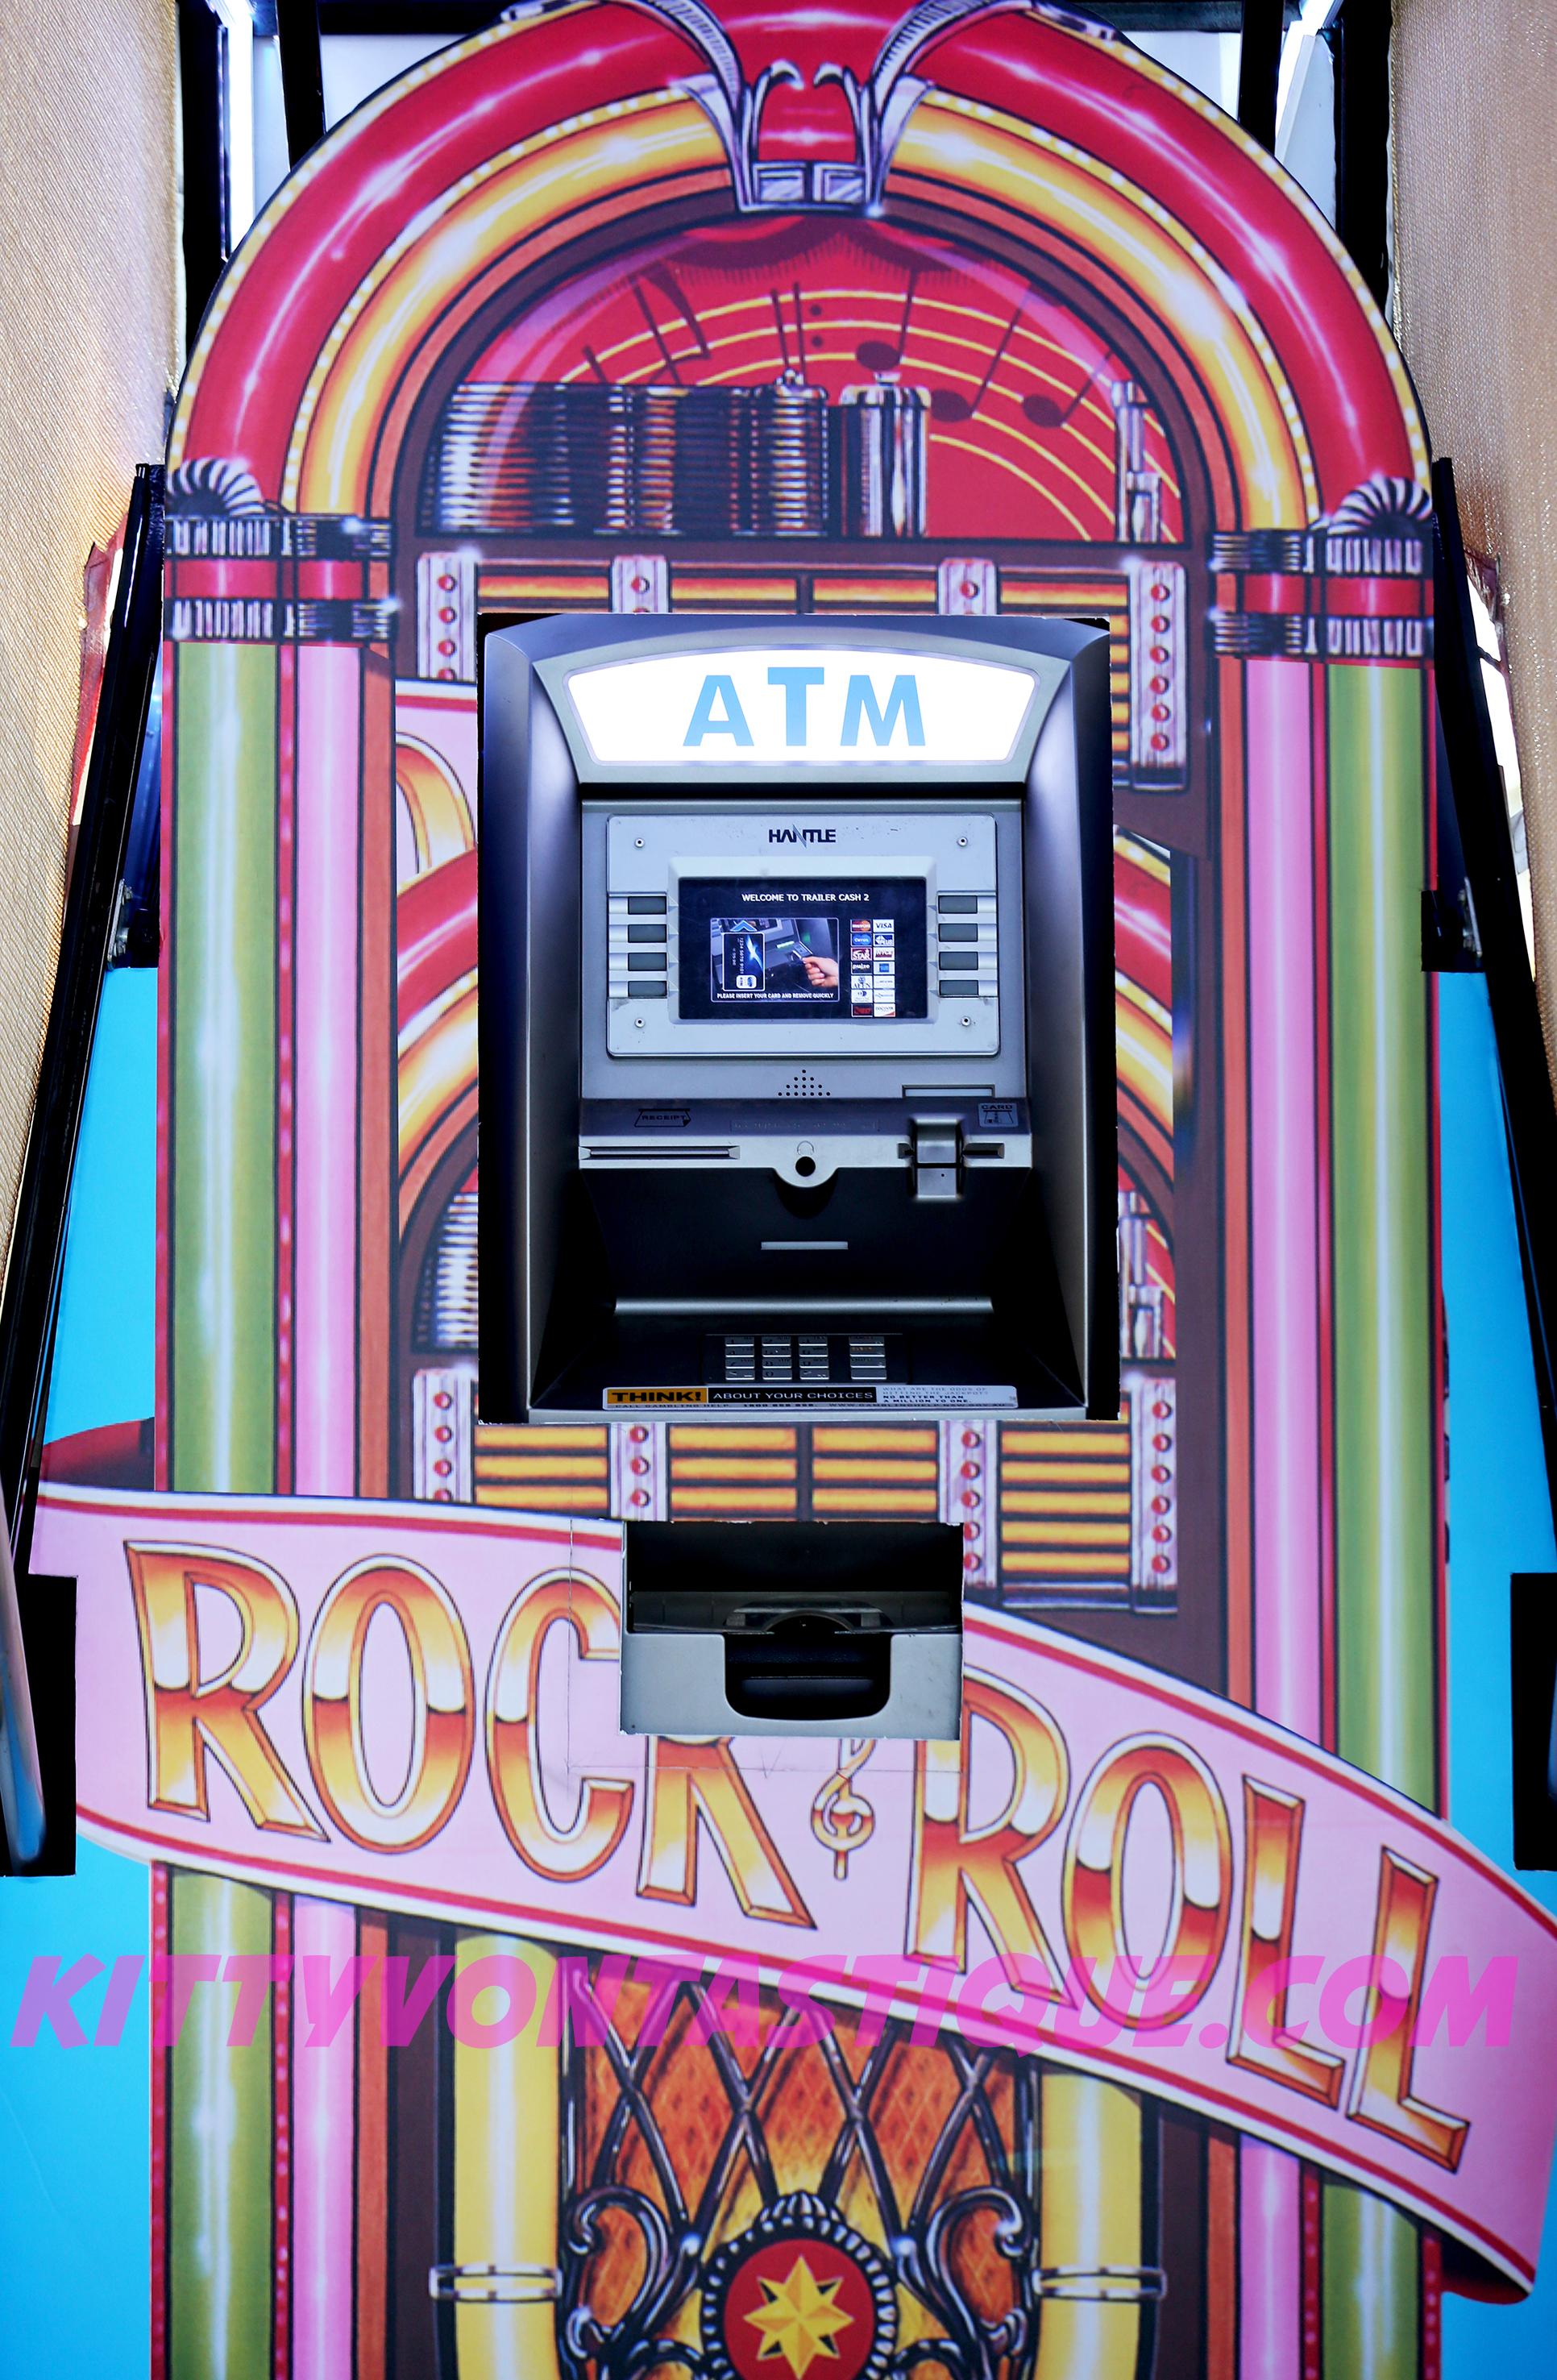 ATM copy.jpg